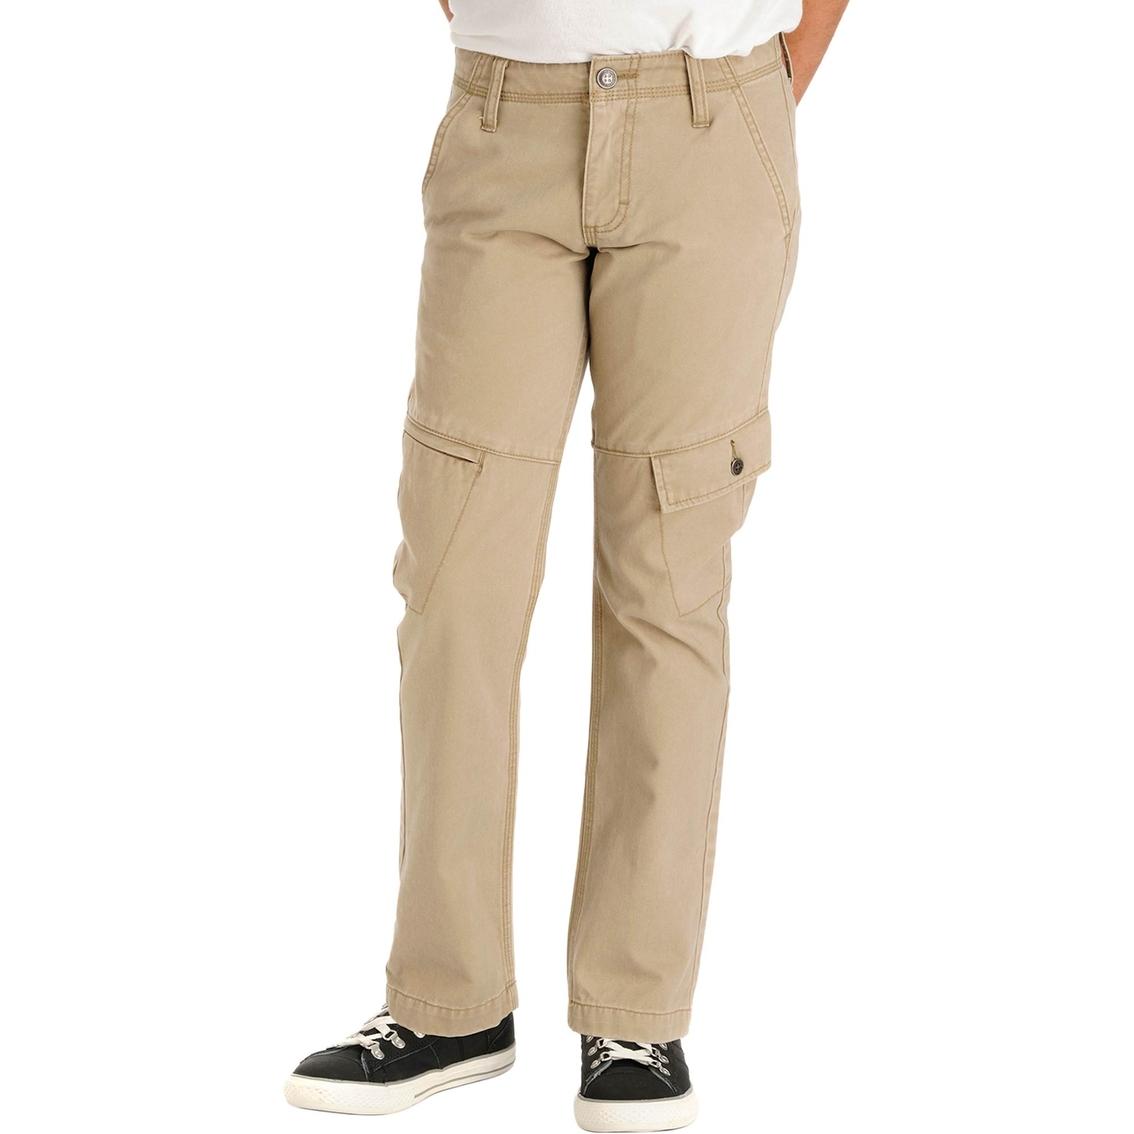 Lee Boys Slim Fit Cargo Pants | Pants | Apparel | Shop The Exchange